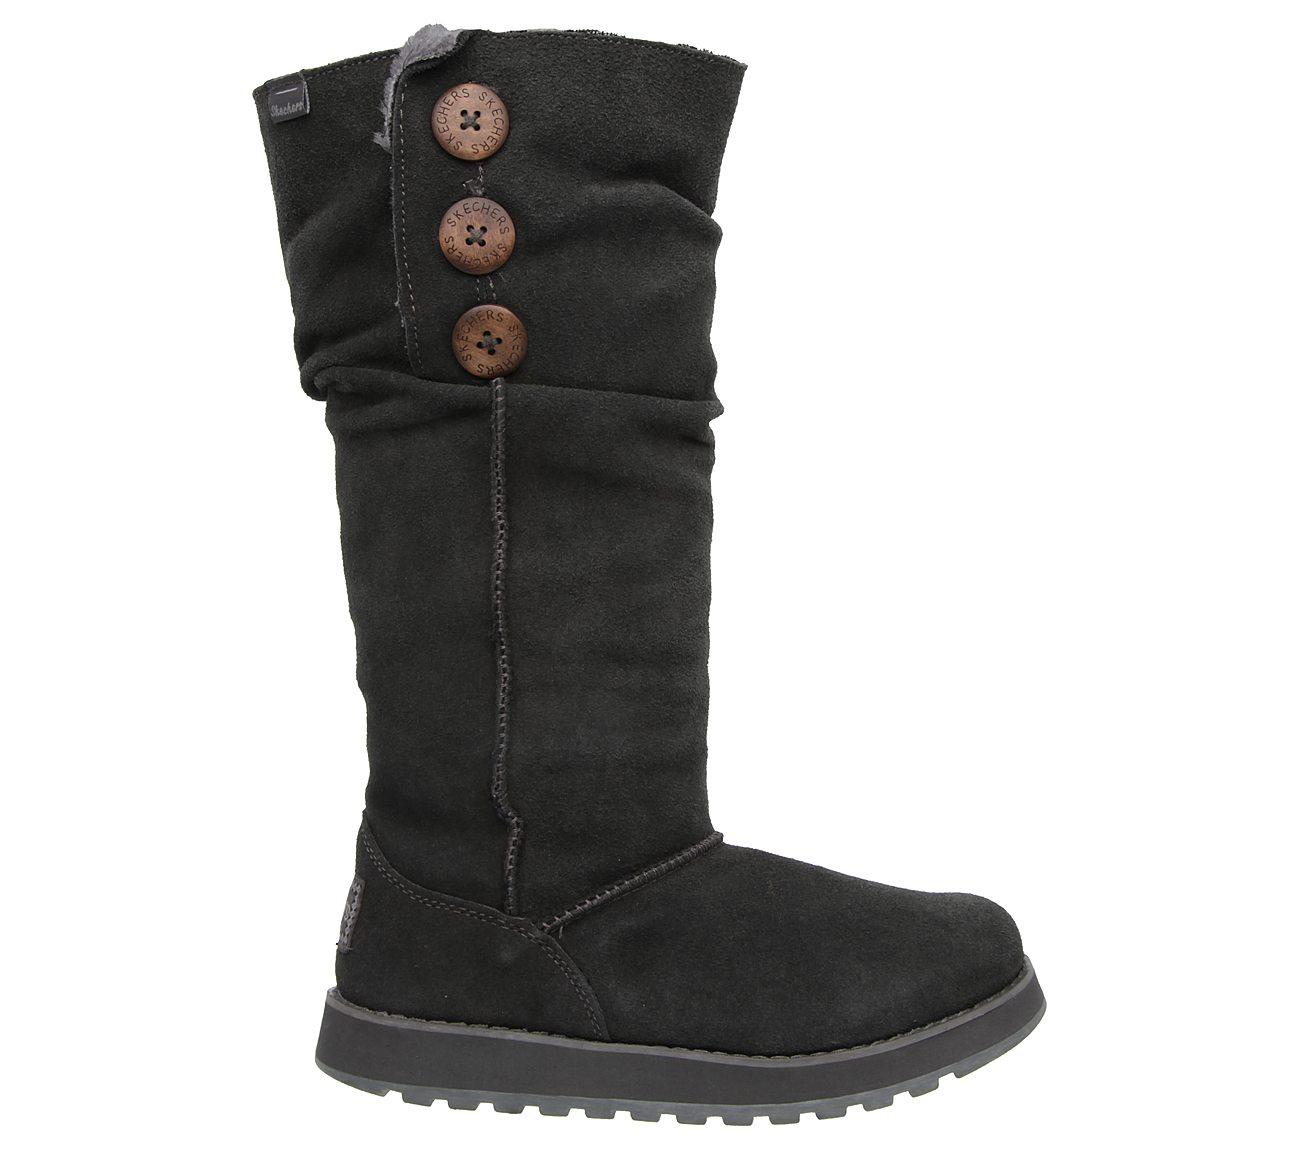 Skechers Keepsakes Brrrr Boots   Tall Boots   Shoes   Shop